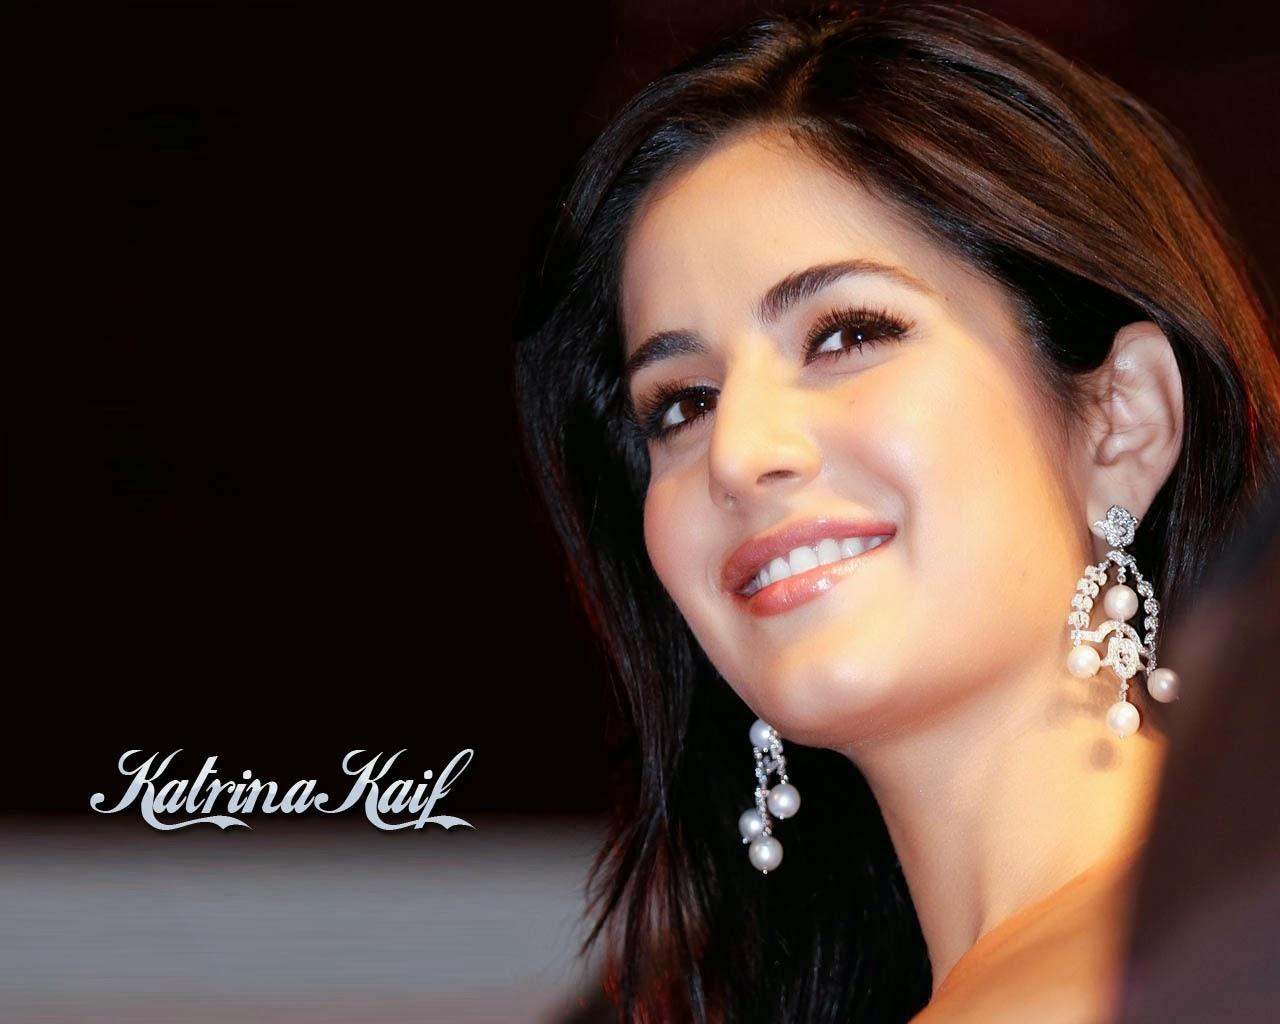 Katrina Kaif Bollywood Most Famous Wallpapers   Beautiful 1280x1024